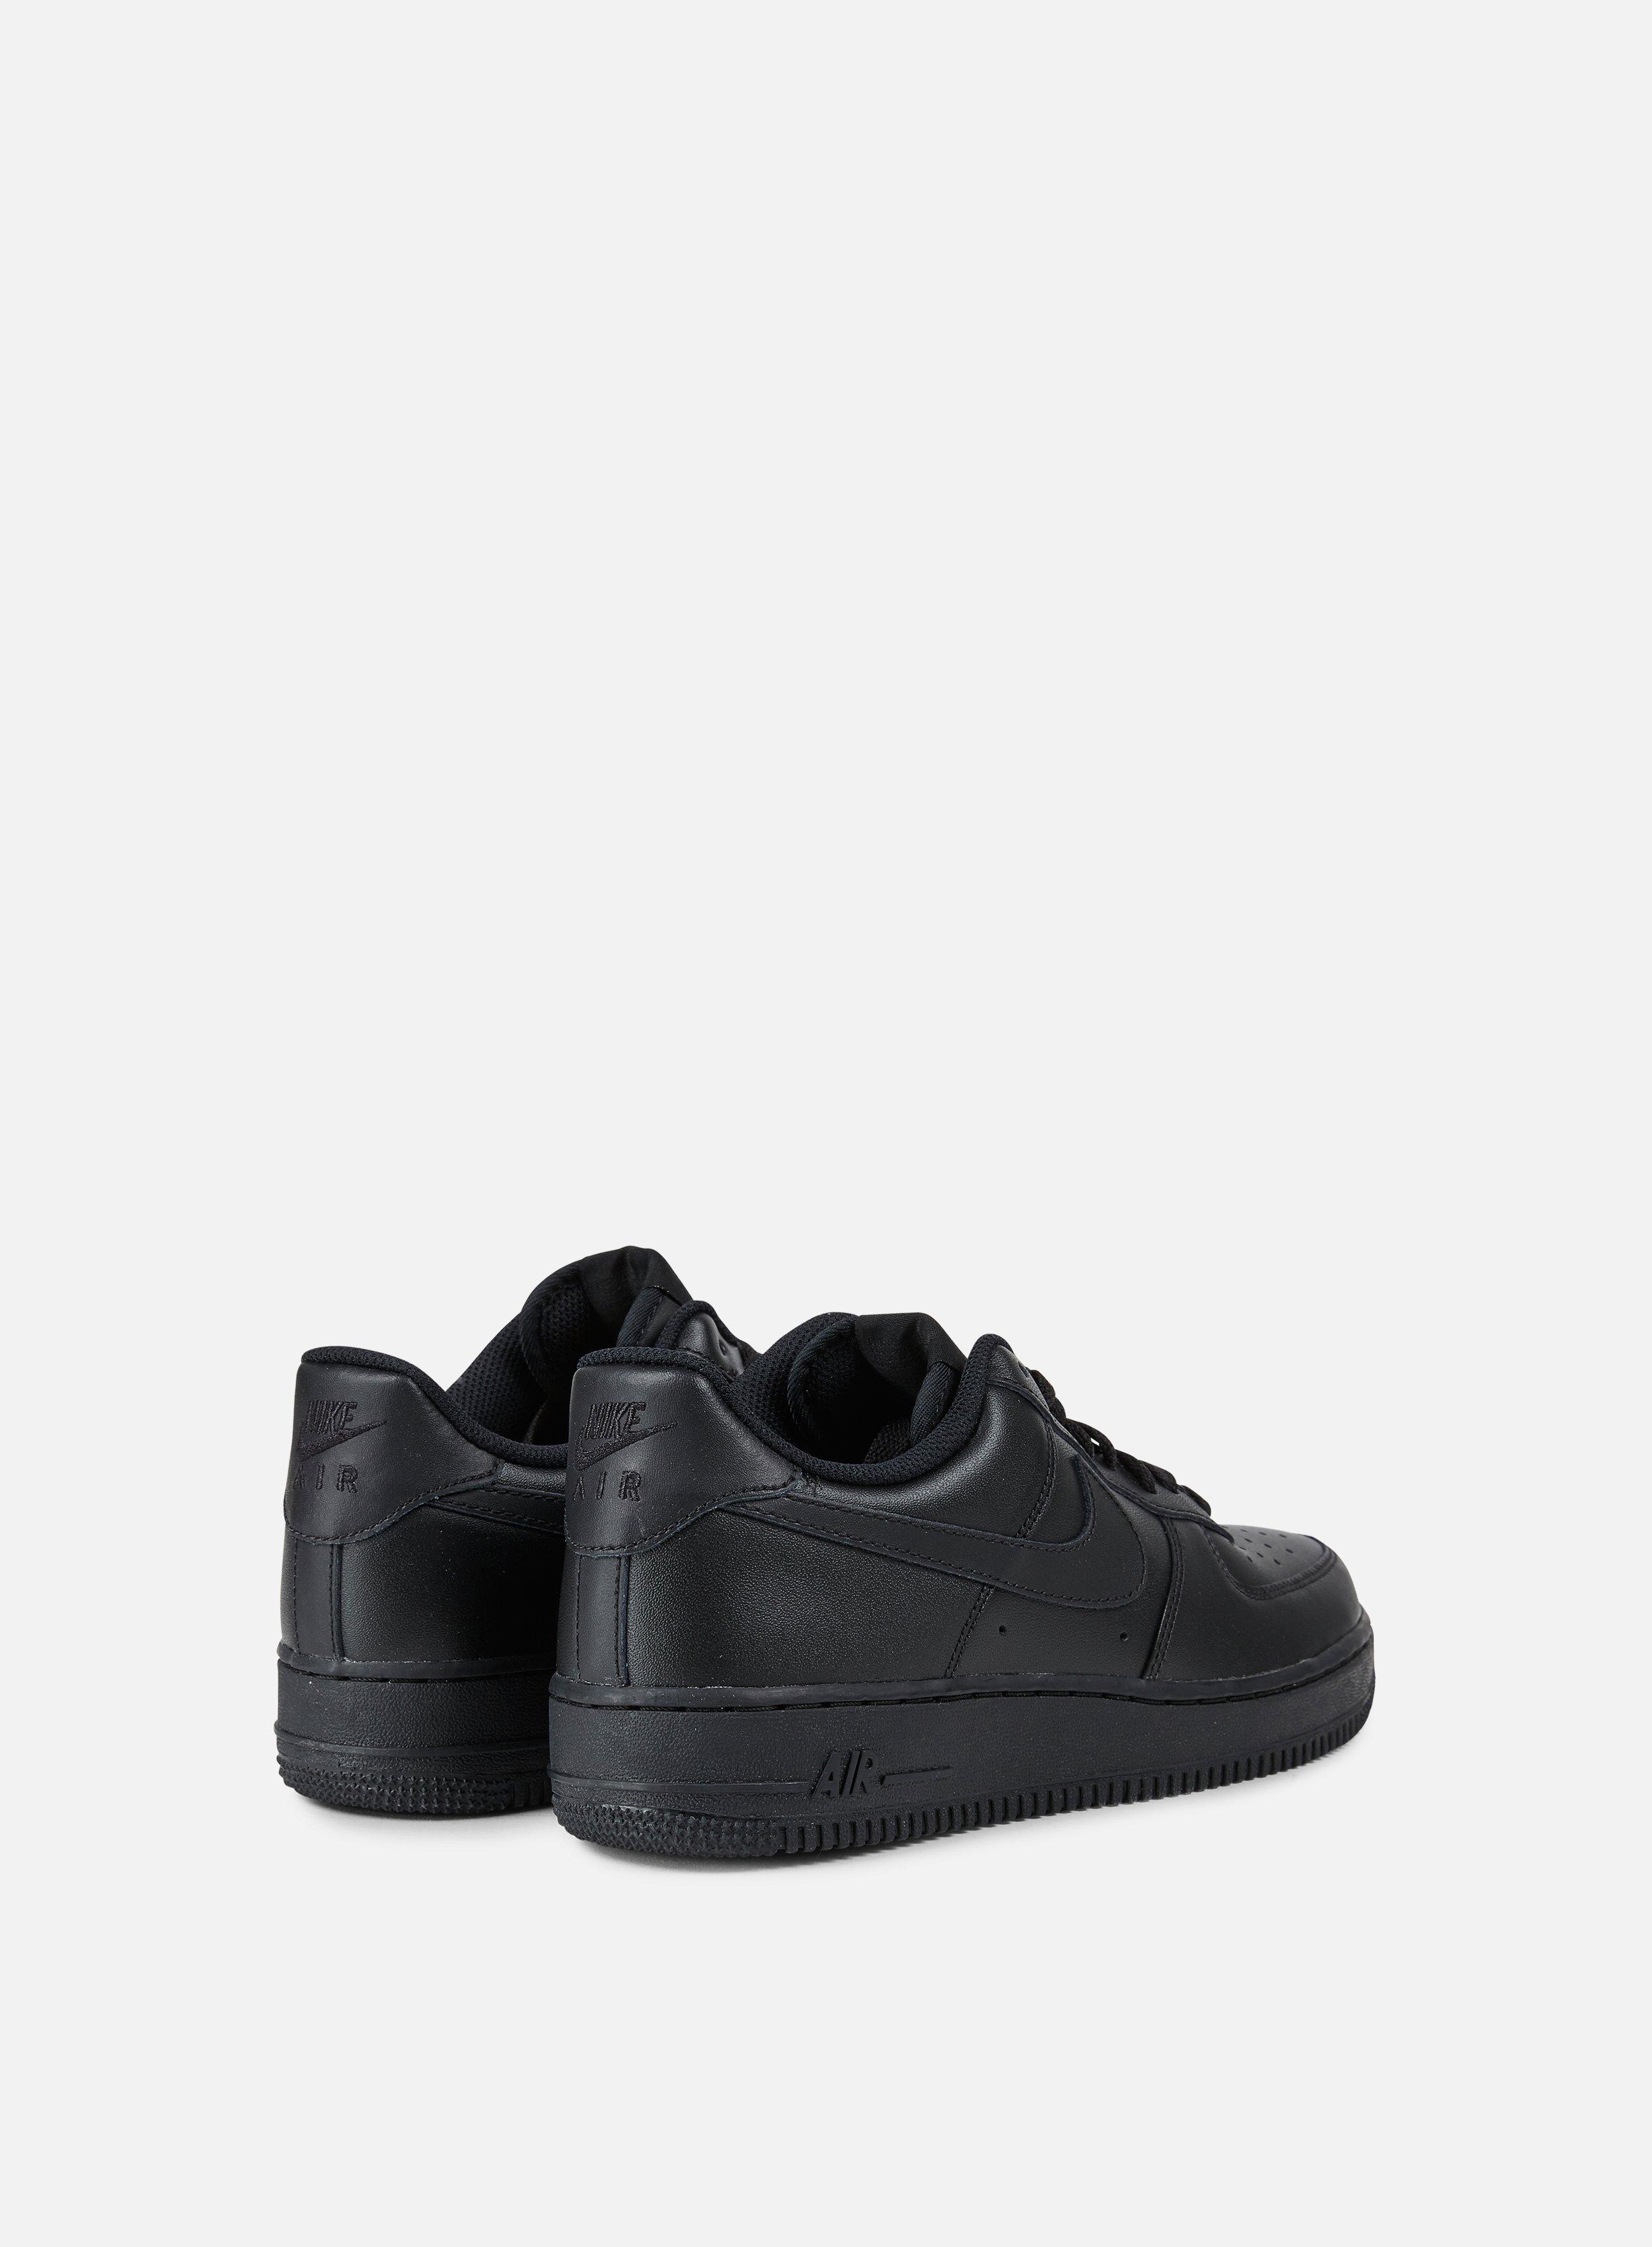 Nike Air Force 1 07 Men, Black Black Black | Graffitishop